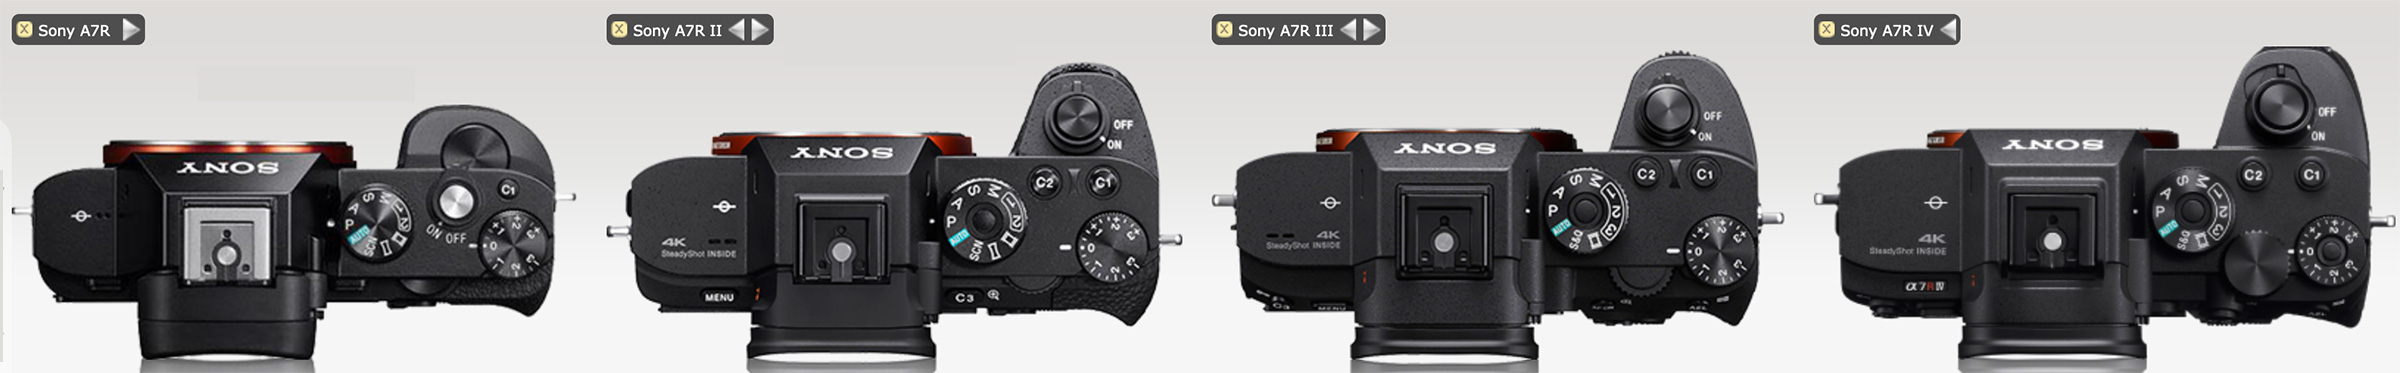 Линейка Sony a7R становится крупнее